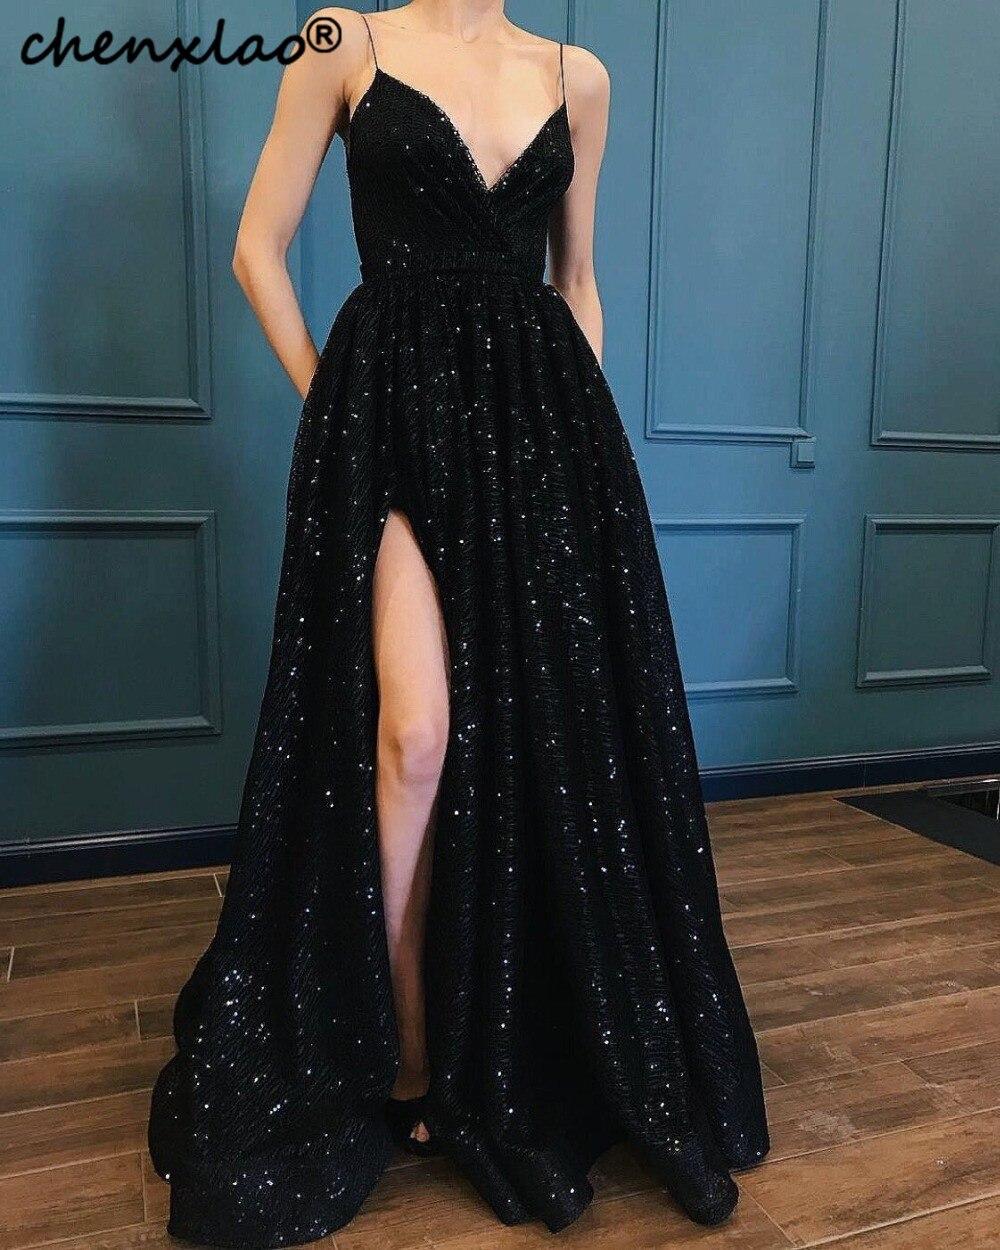 Spaghetti Straps Gorgeous A Line Prom Dress Lace Sparkling Evening Gown Vestido De Festa Longo Sexy A Line Long Dress